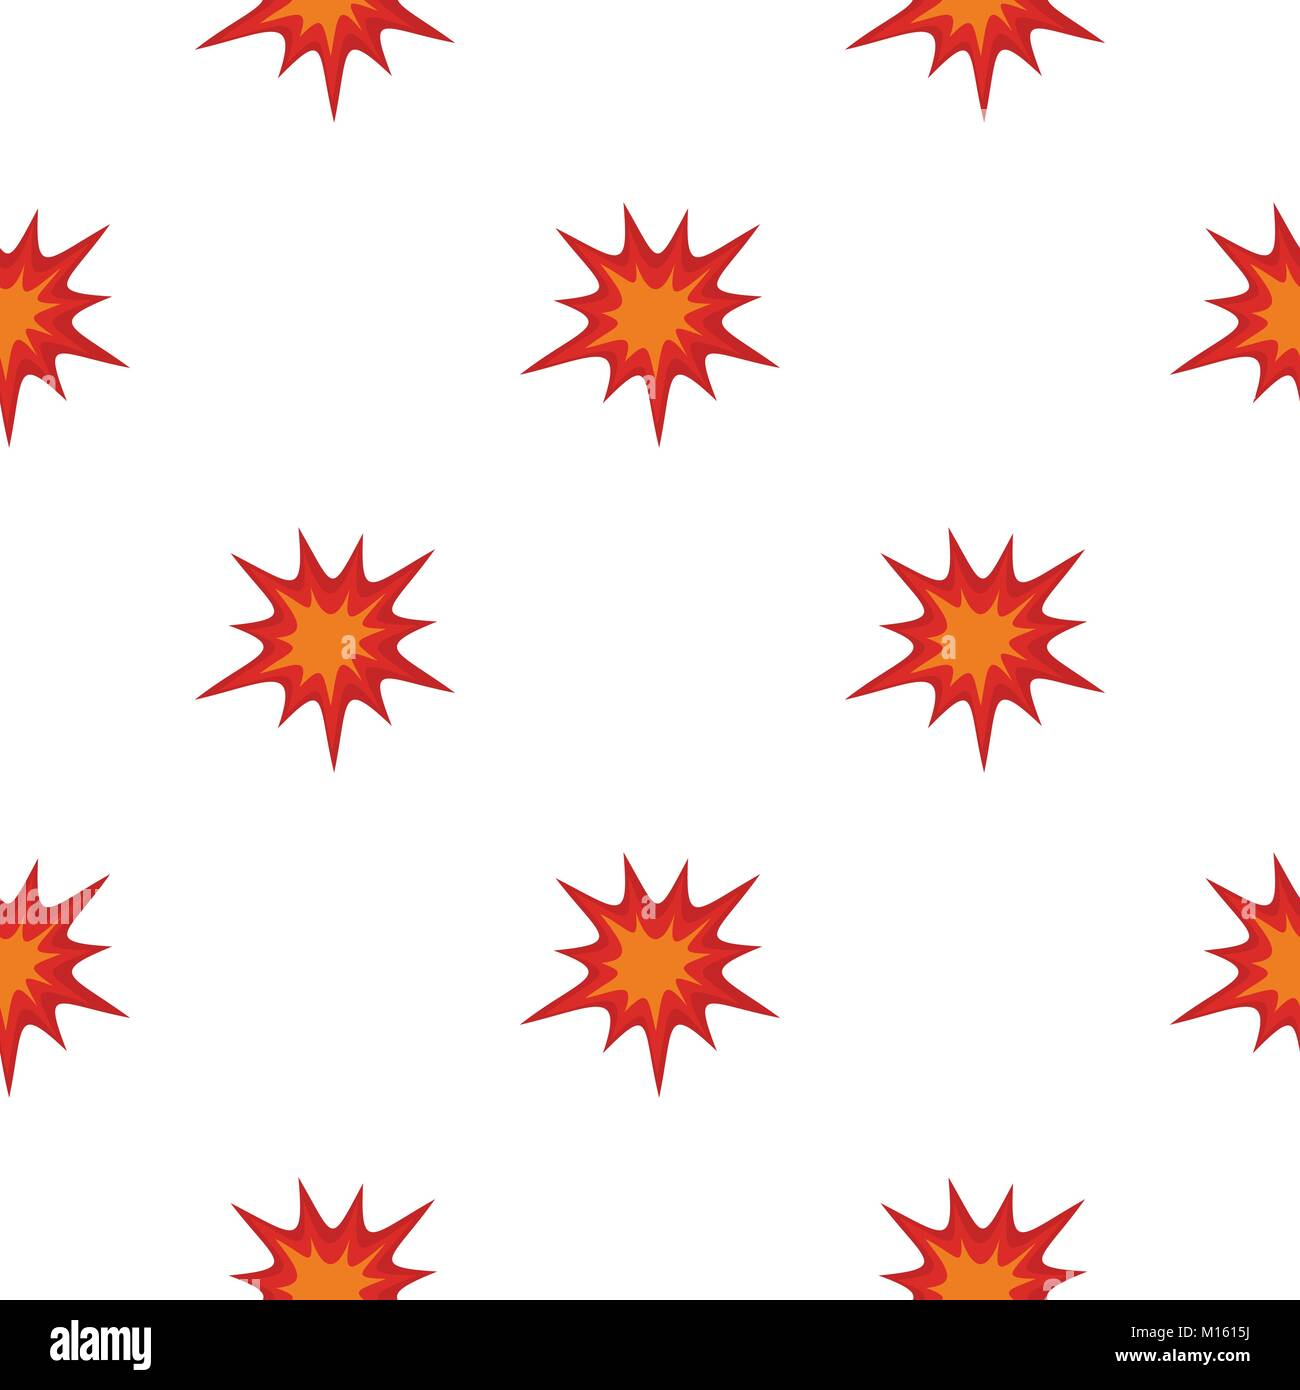 Heavy explosion pattern seamless - Stock Image